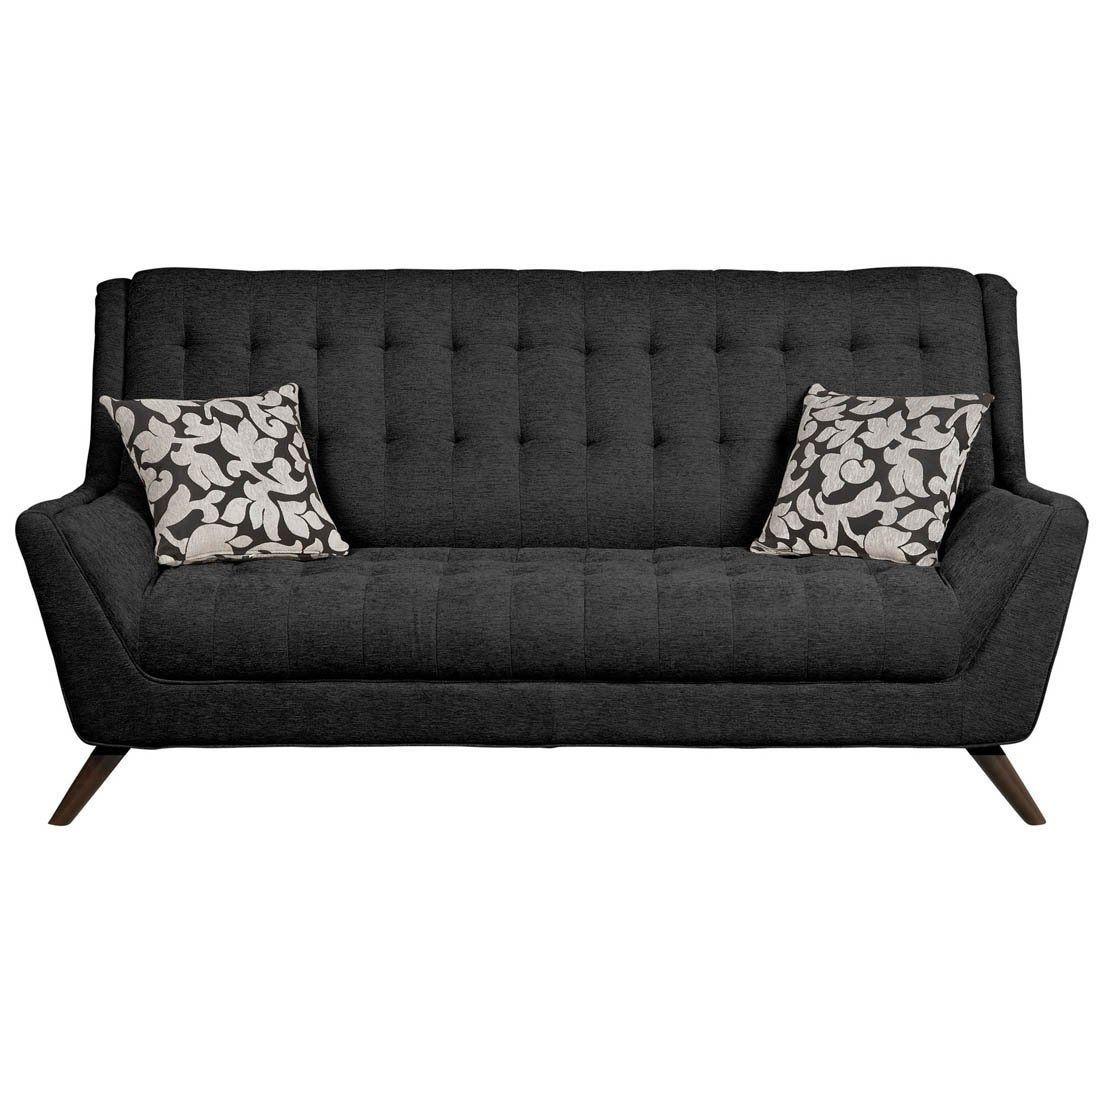 Modern Retro Sofa And Loveseat Sleeper Sofas For Studio Apartments Mid Century Design Casual